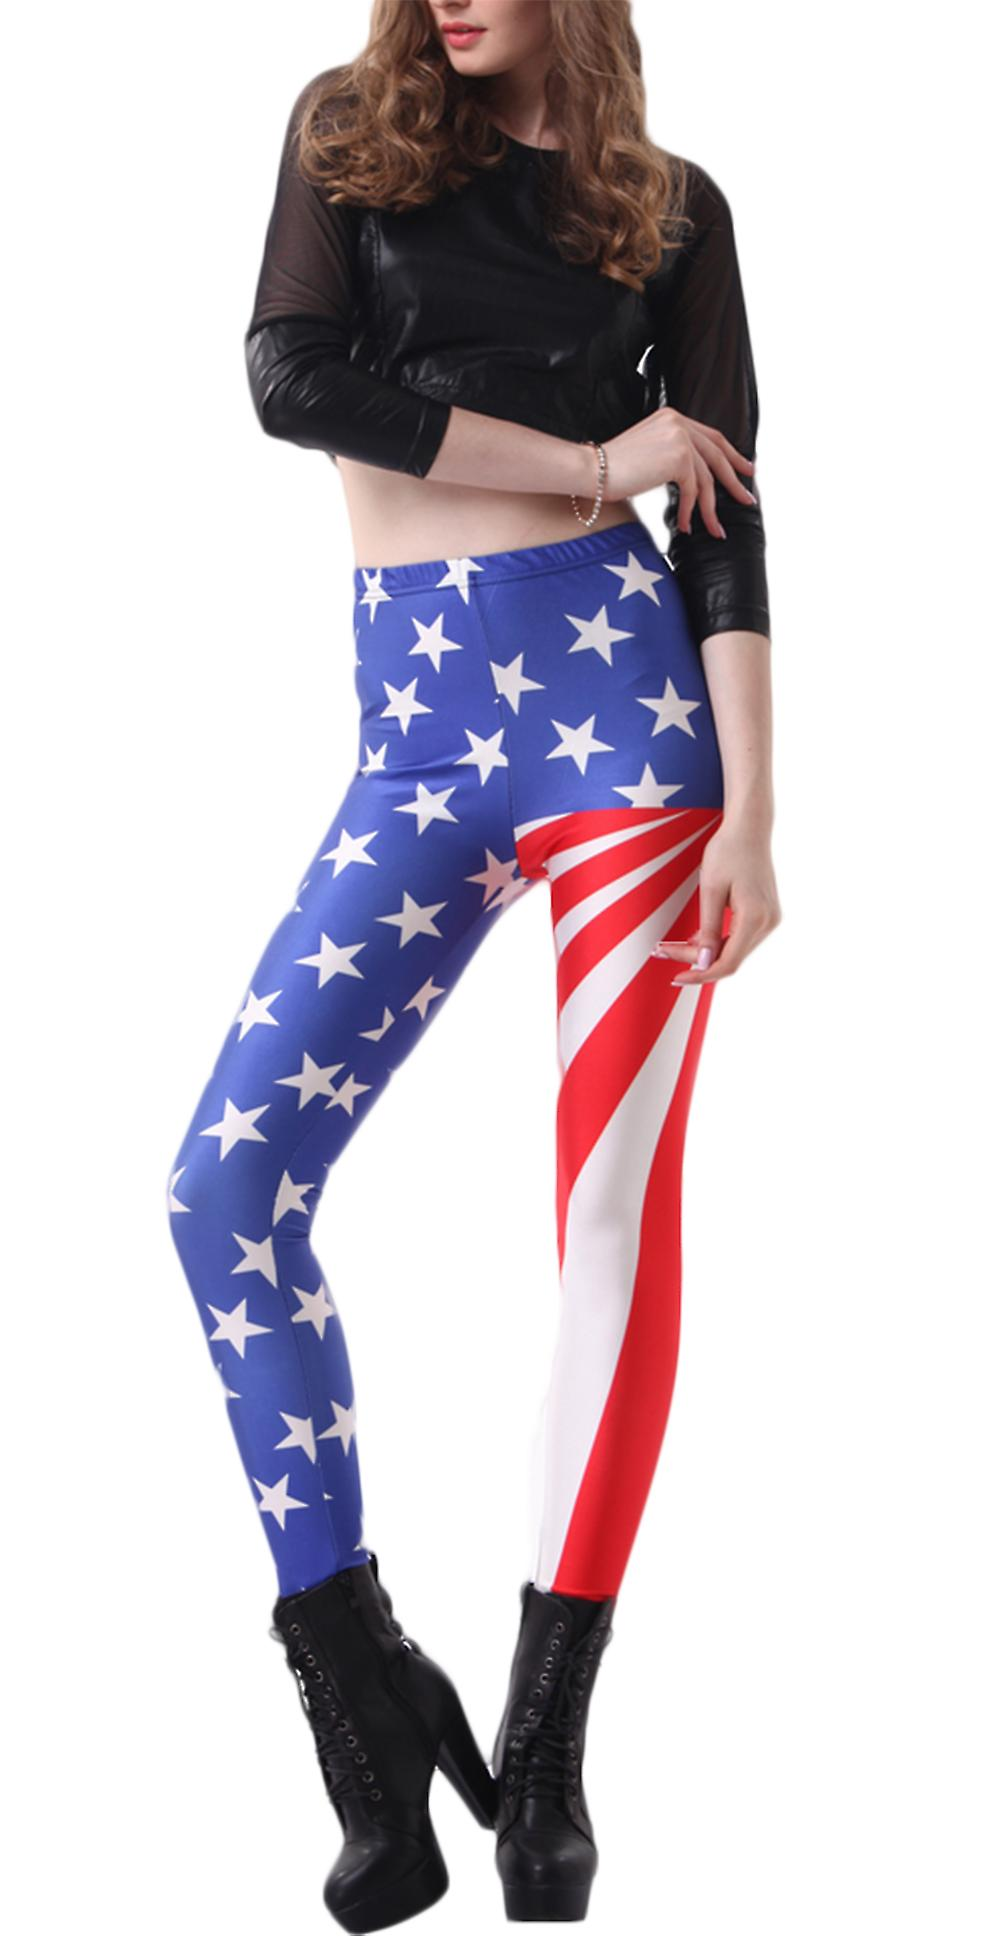 Waooh - Legging American flag printed Ifru